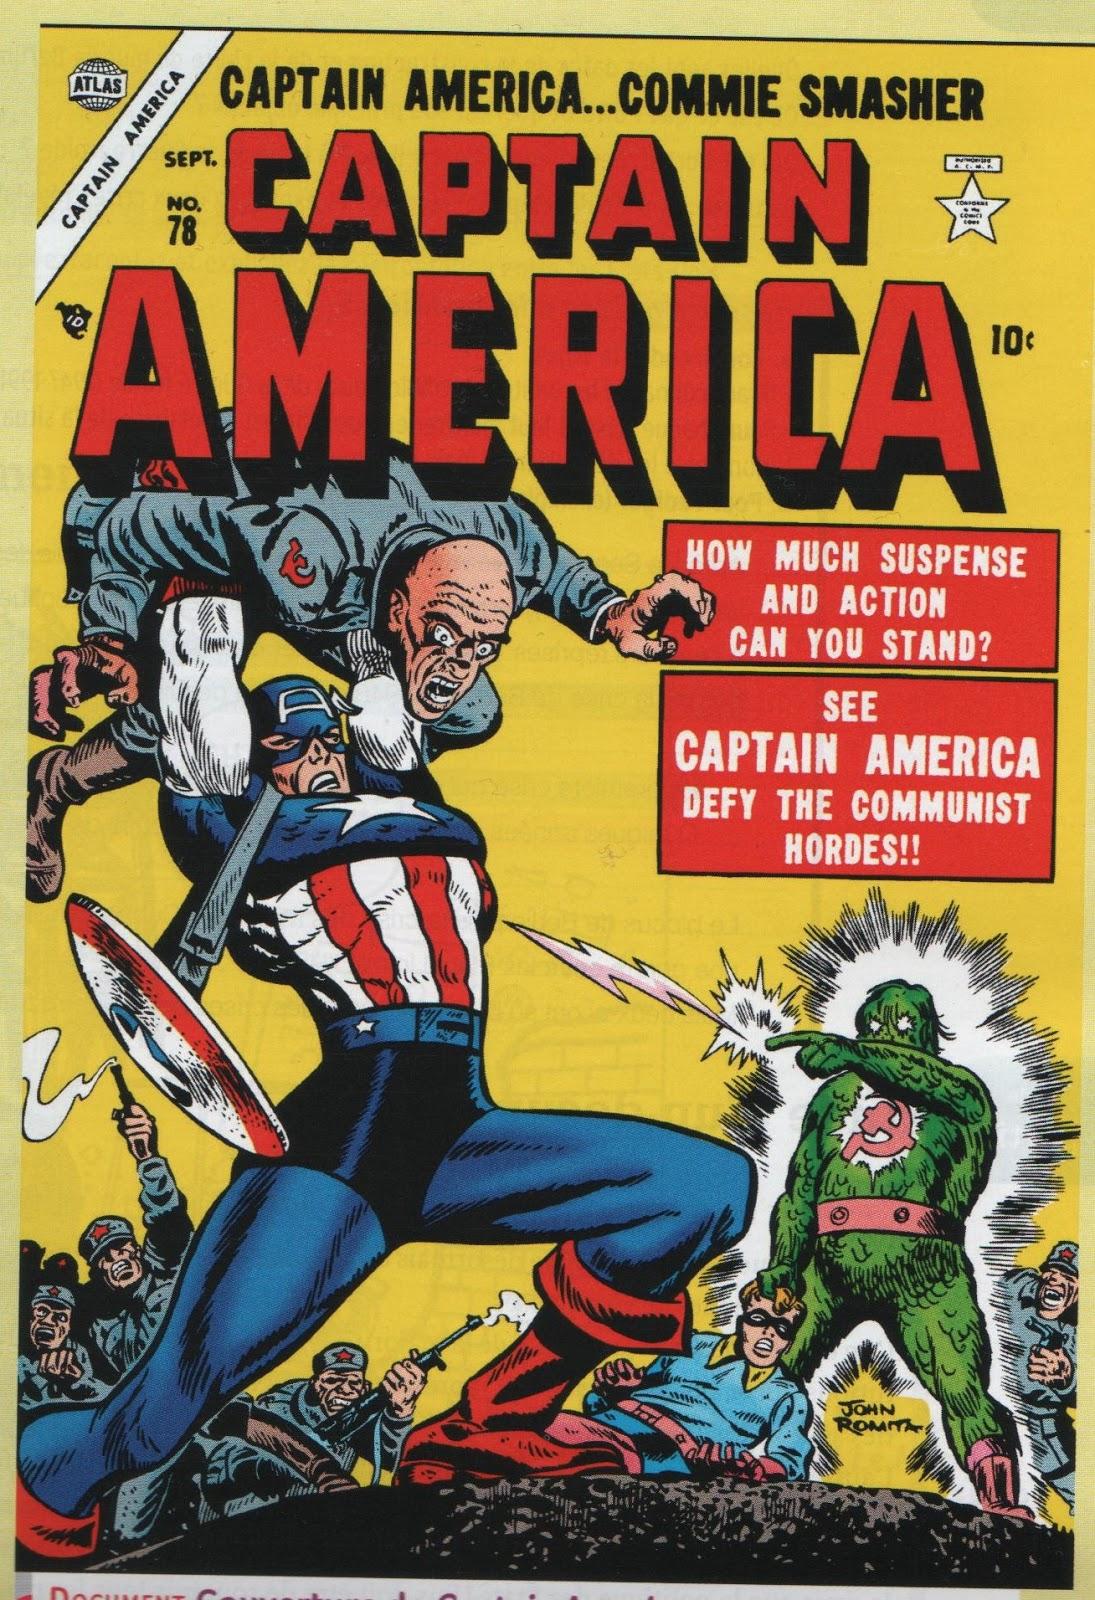 Captain America Commie Smasher